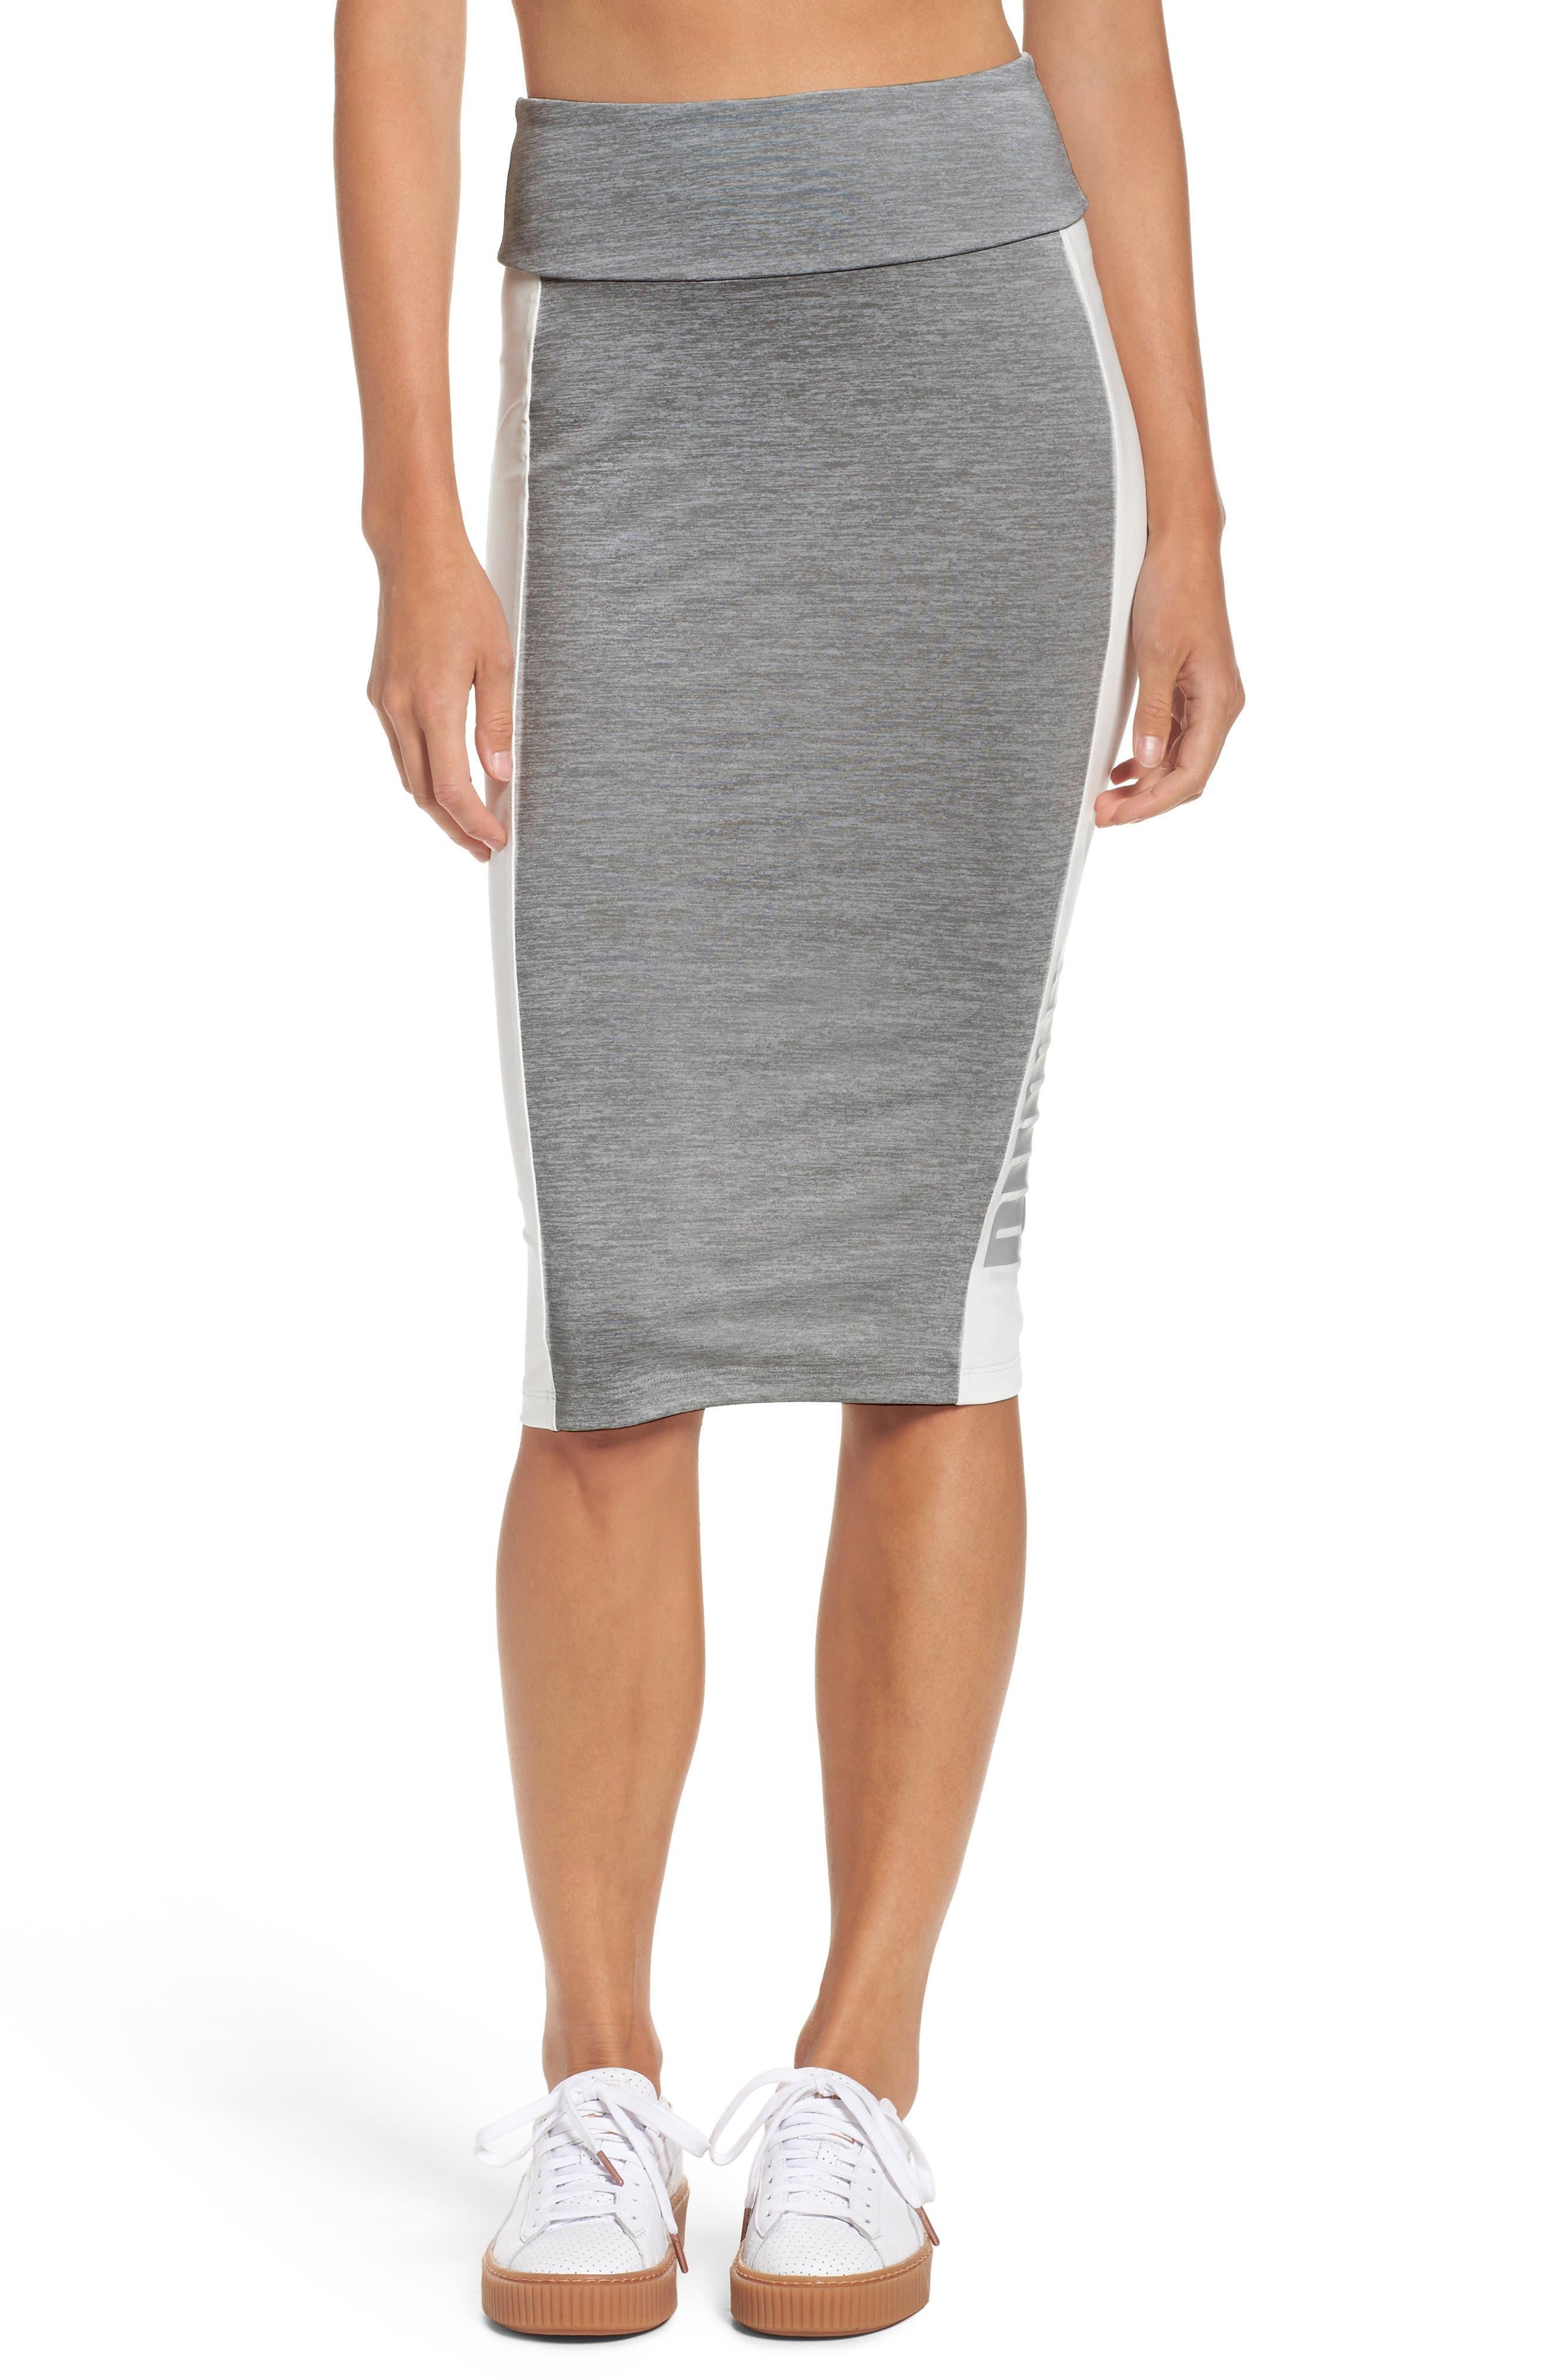 PUMA Archive Logo Pencil Skirt